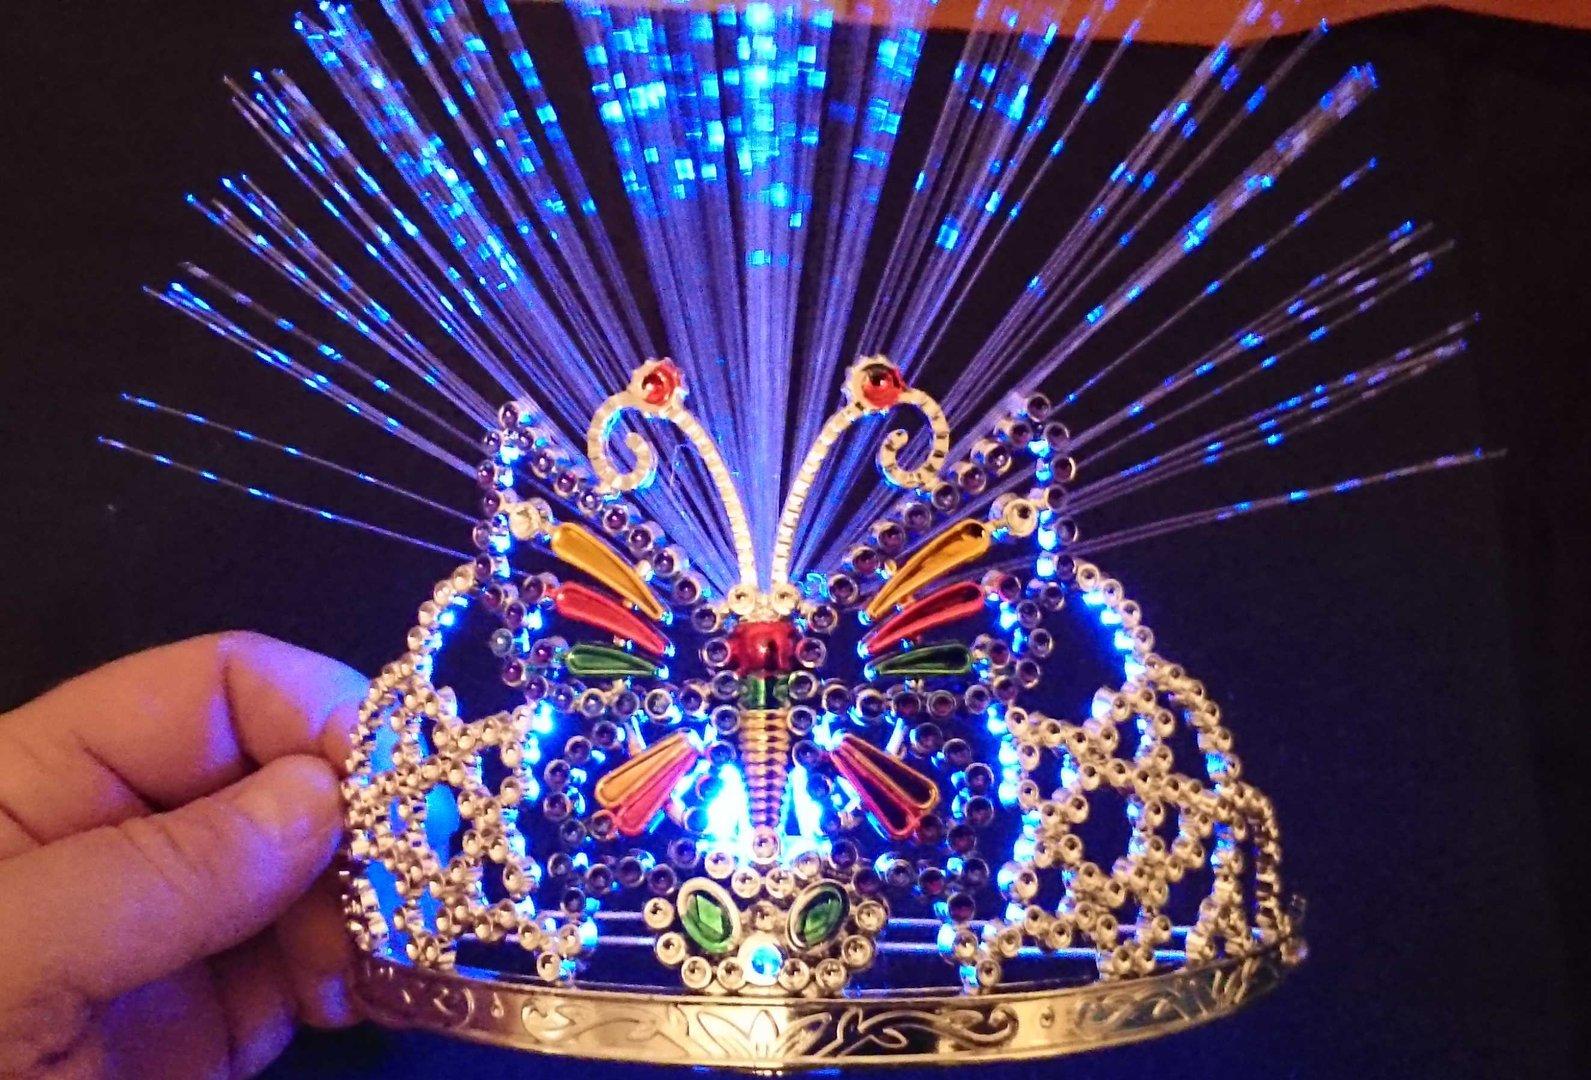 Led Crown Tiara Princess Butterfly Luminous Hairband